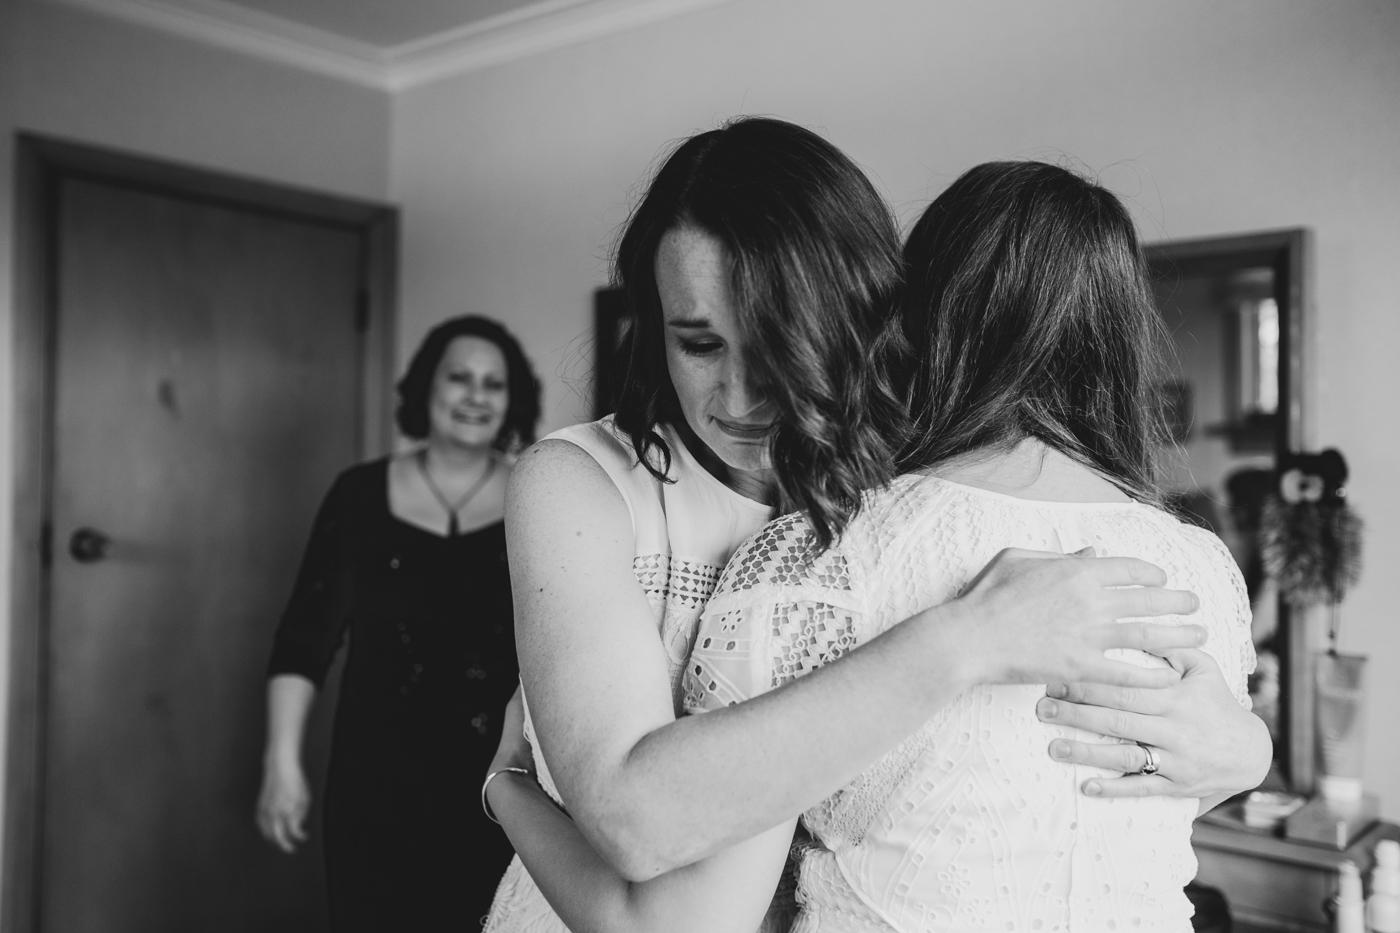 Ariana & Tim - Dunedin, New Zealand Wedding - Destination Wedding - Samantha Heather Photography-45.jpg